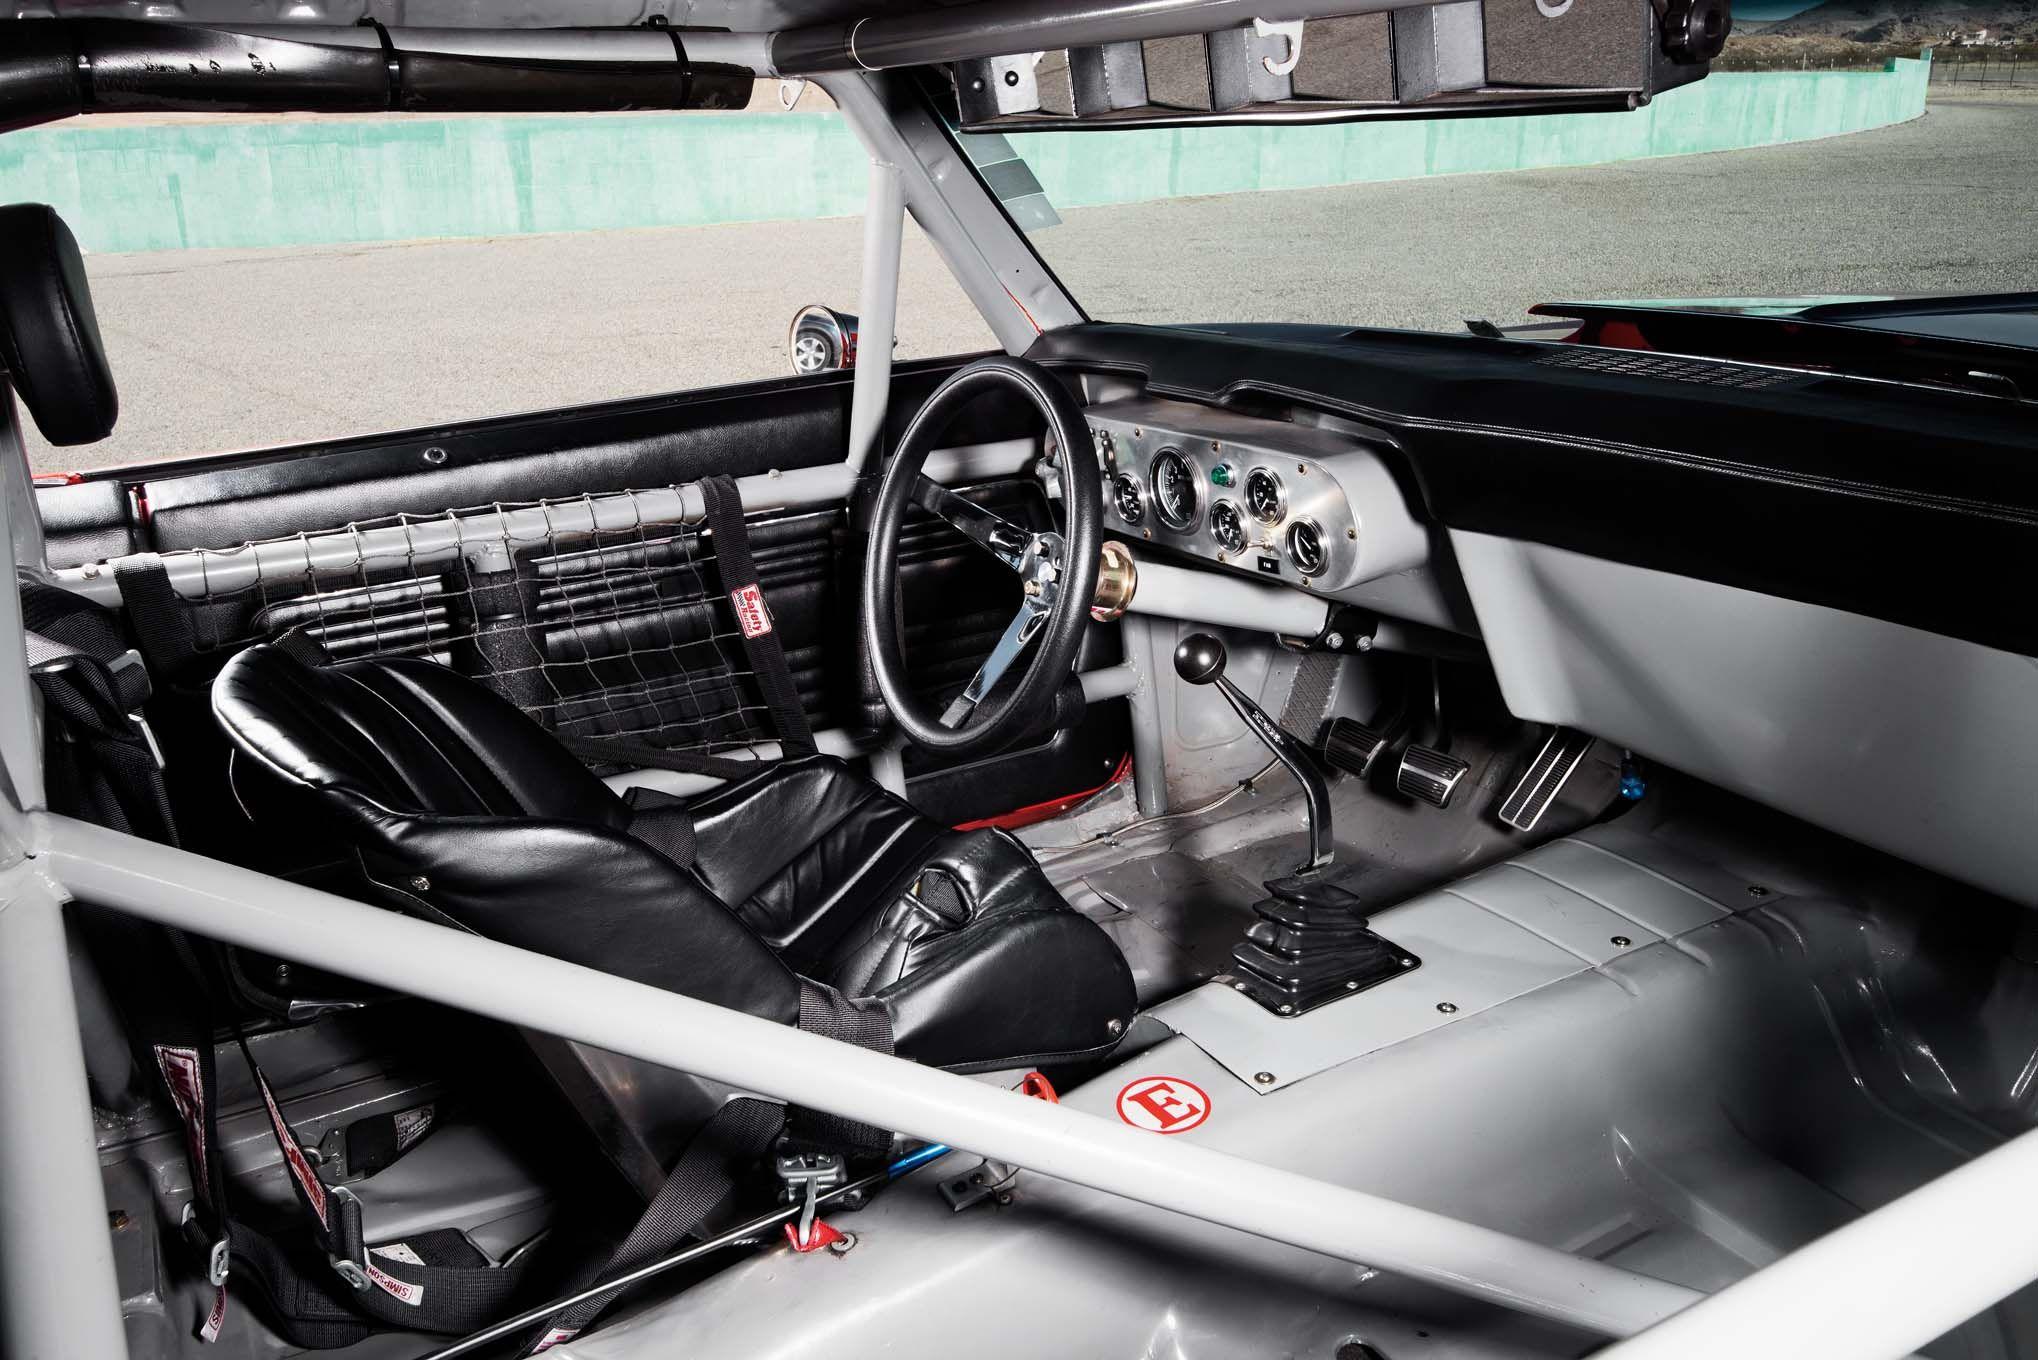 1969-Chevrolet-Camaro-Trans-Am-Race-Car-interior-02.jpg (2038×1360 ...